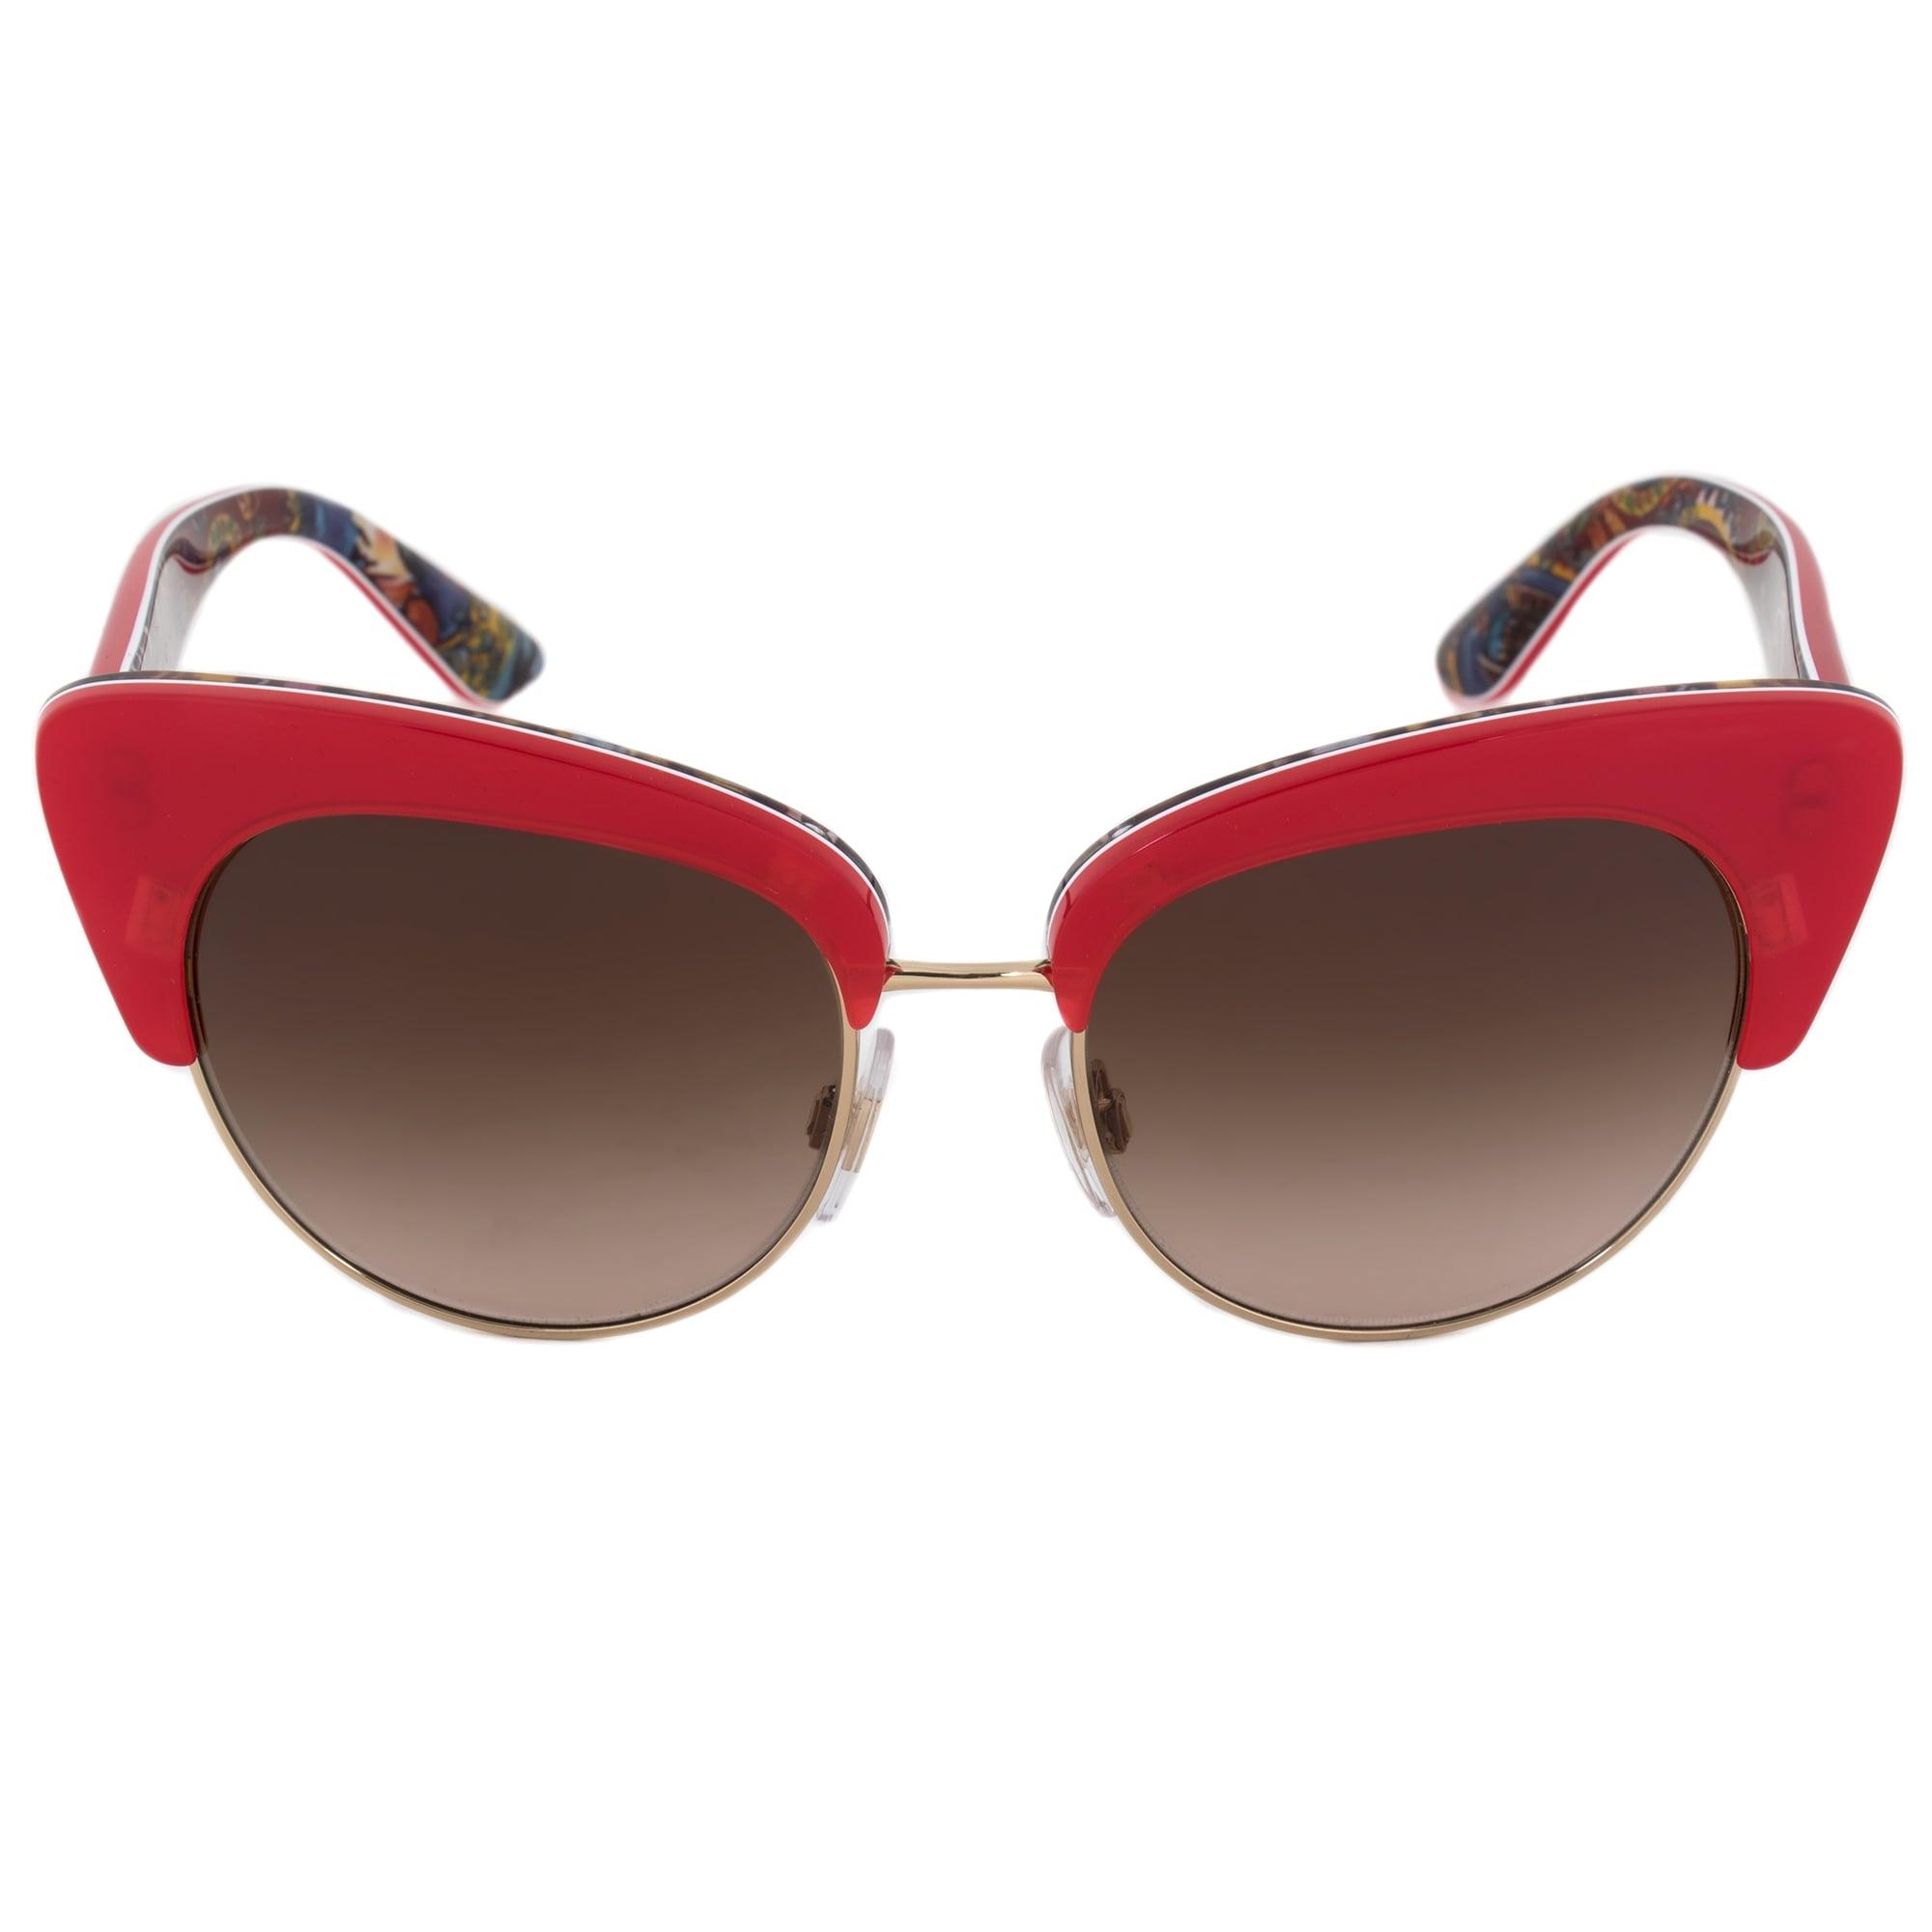 6451a1487f0b Shop Dolce   Gabbana Cat Eye Sunglasses DG4277 303413 52 - Free ...